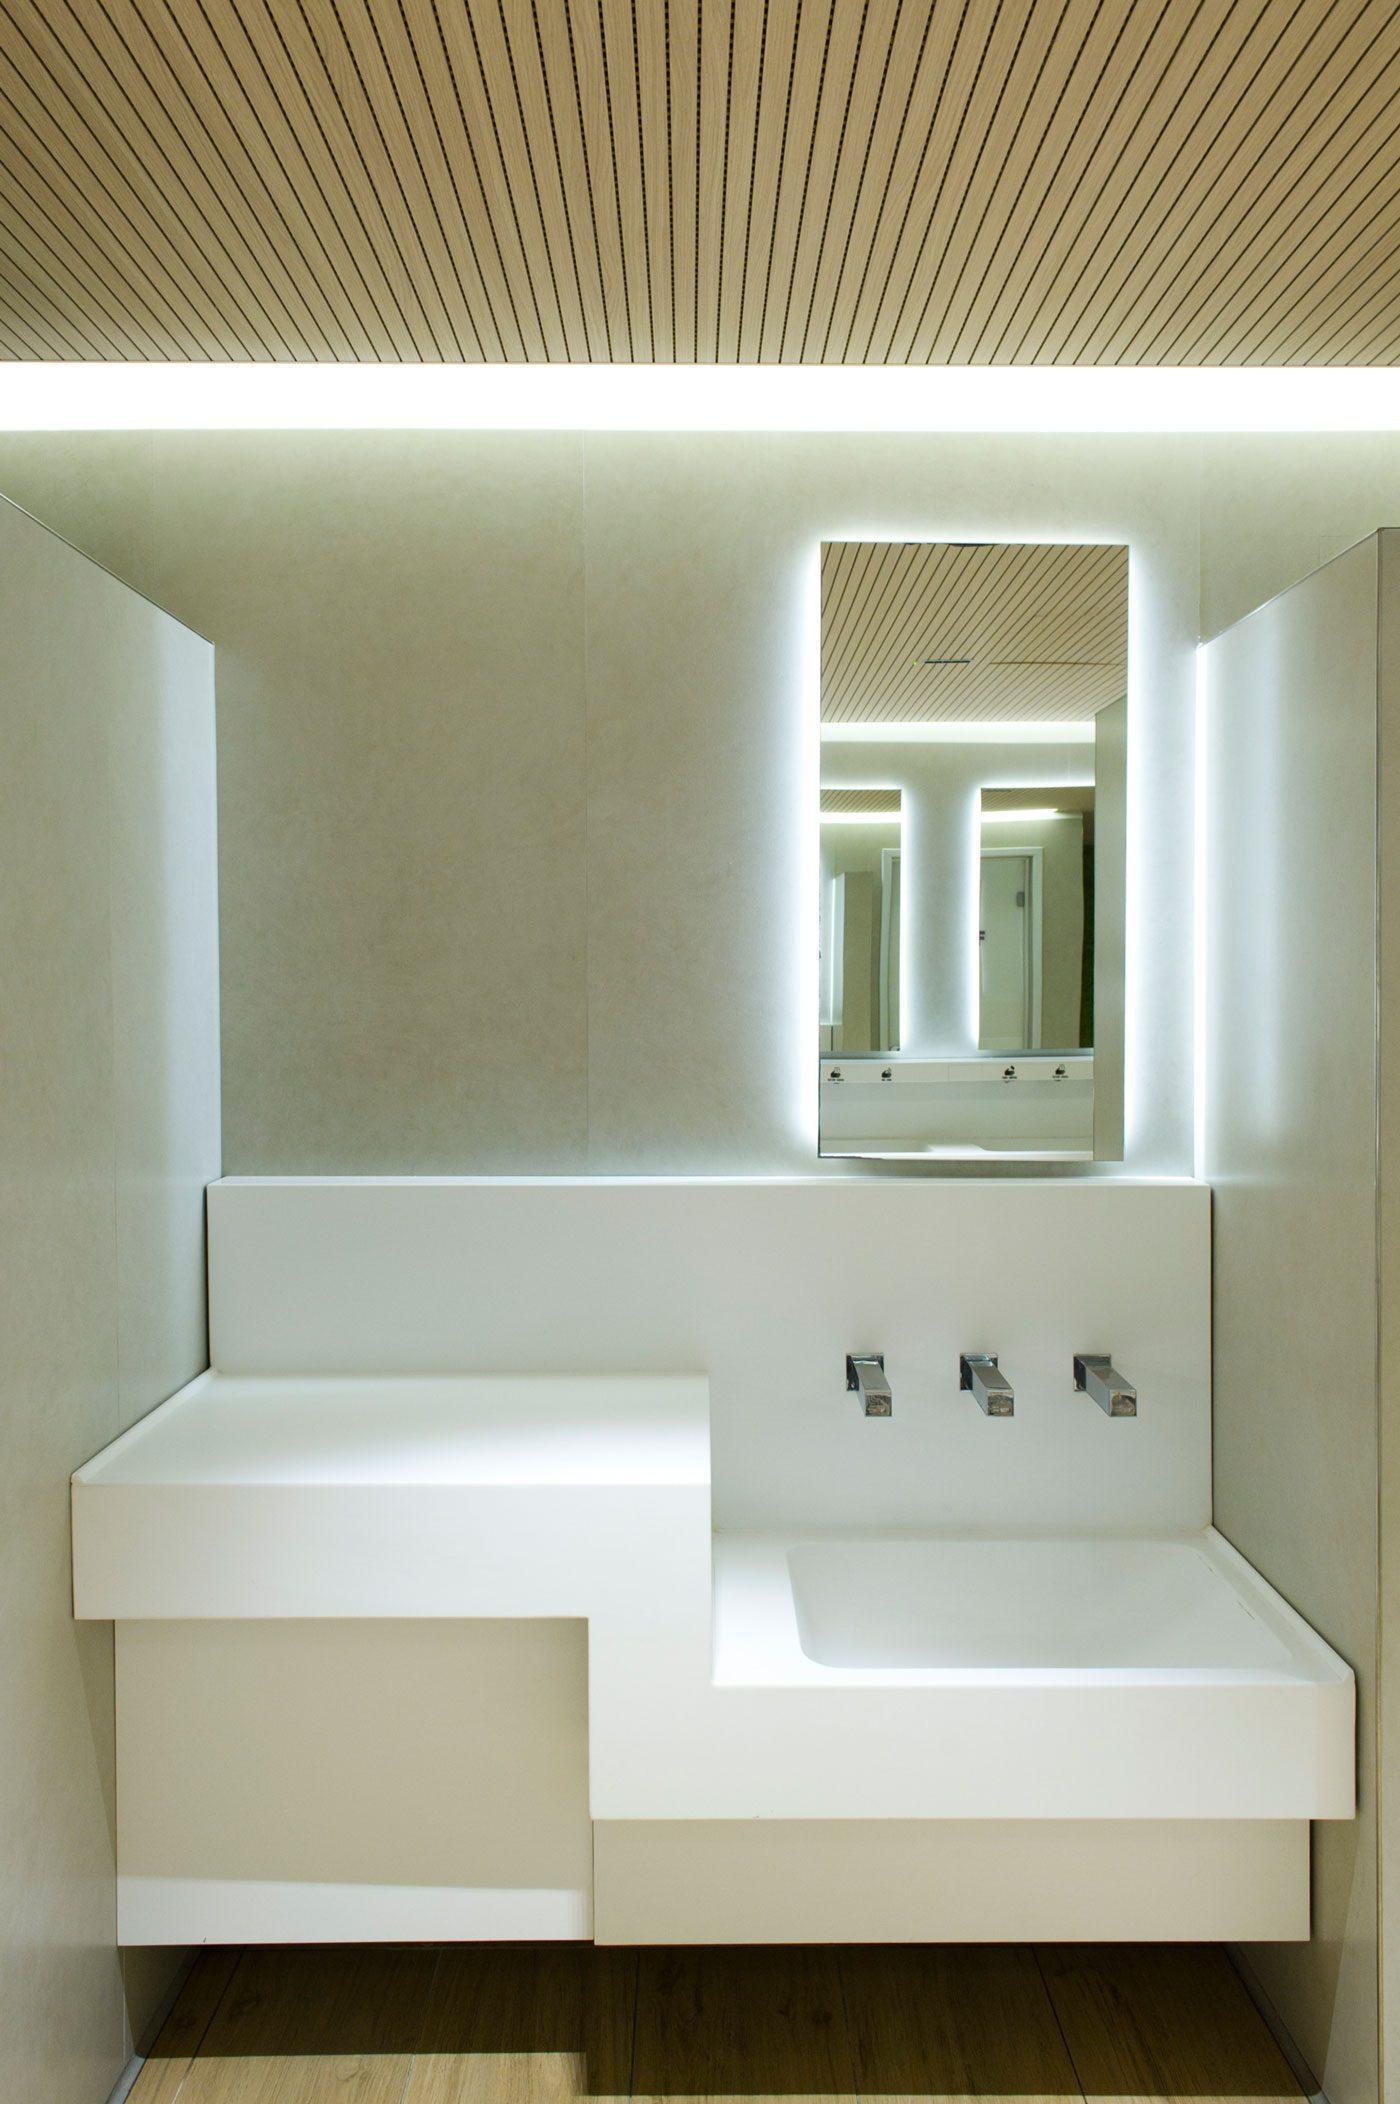 Concept servizi igienici studio muzi e associati for Bagni designer